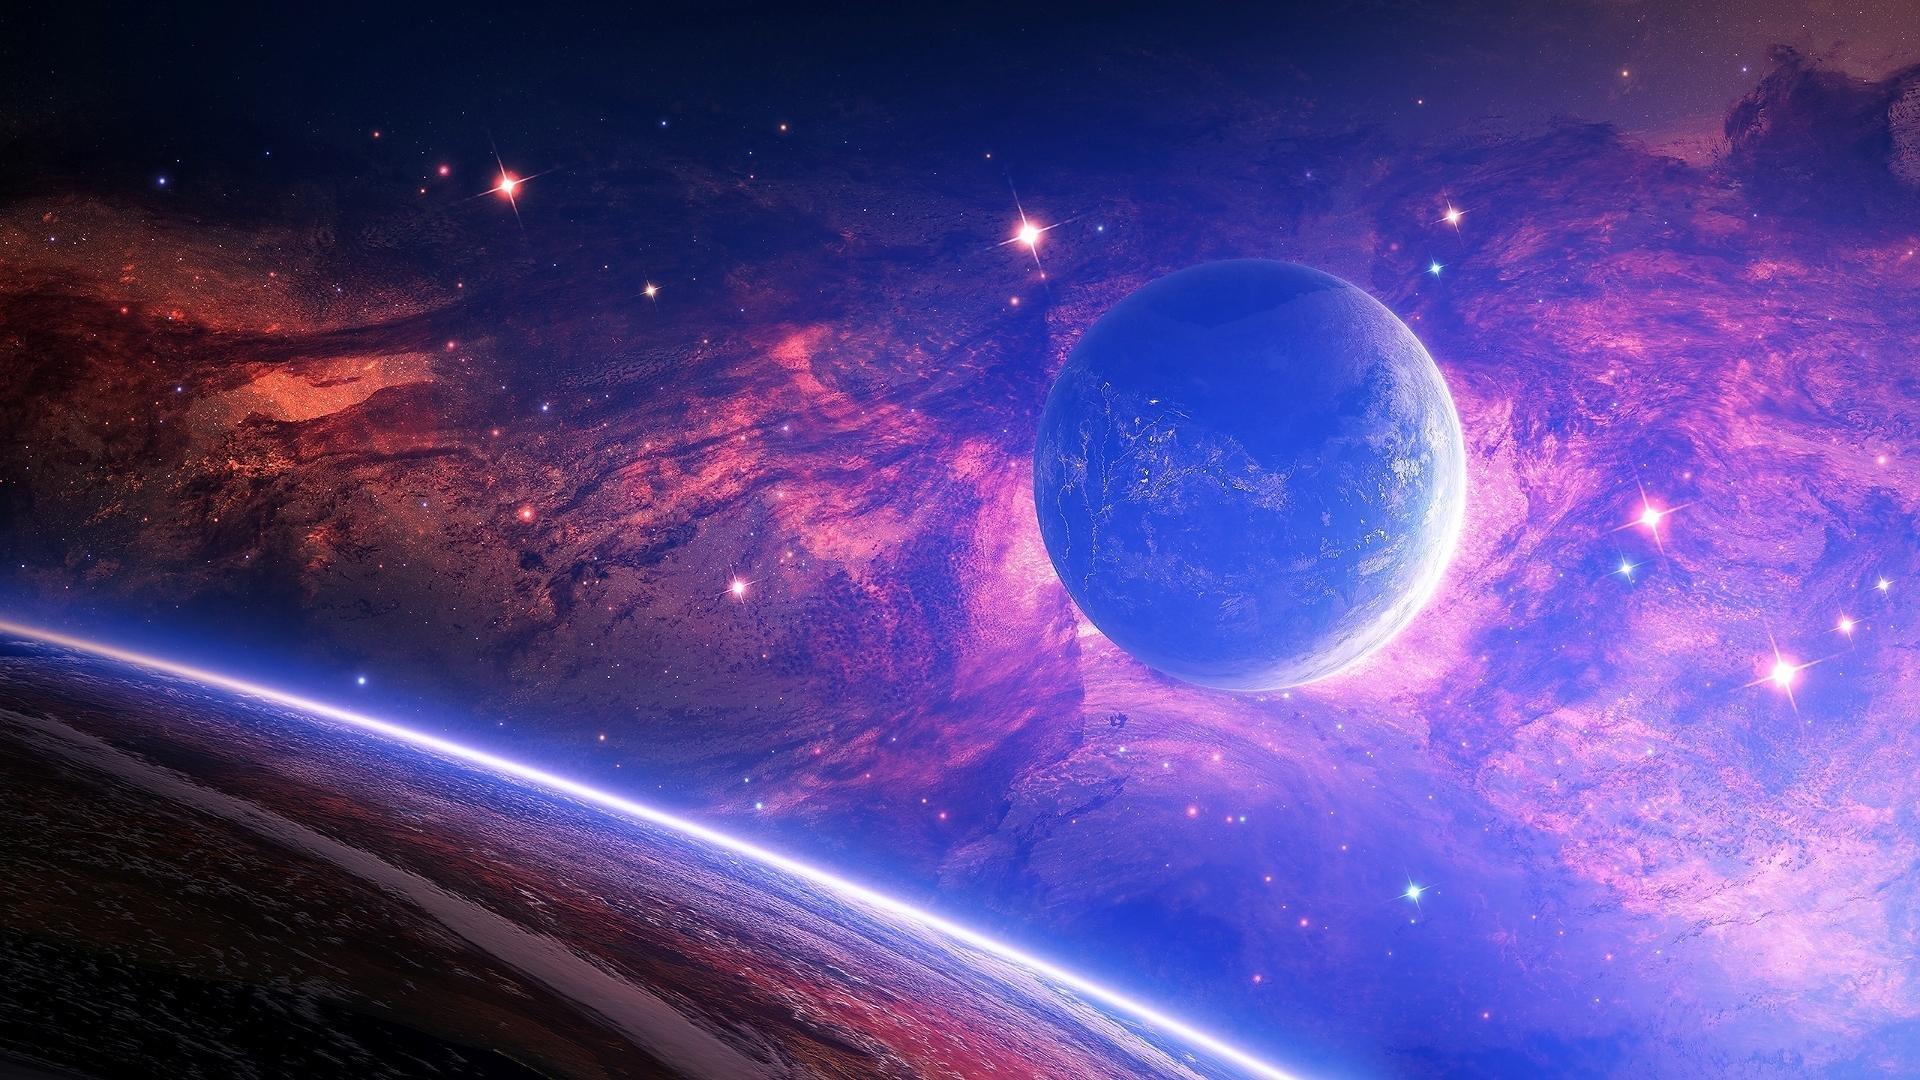 Beautiful Space HD Desktop Wallpapers 81+ images